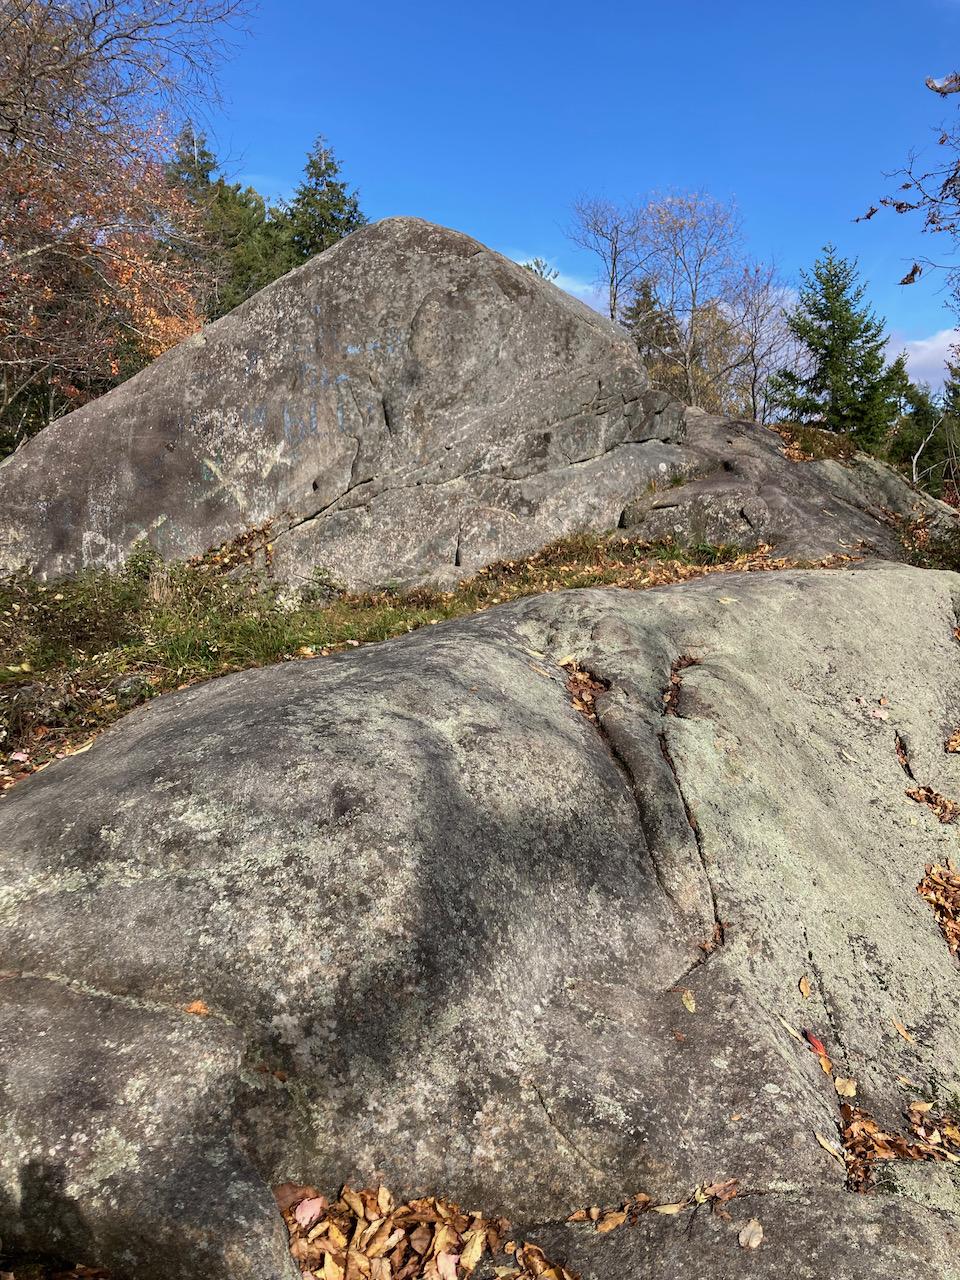 Bare rockface near top of hill.